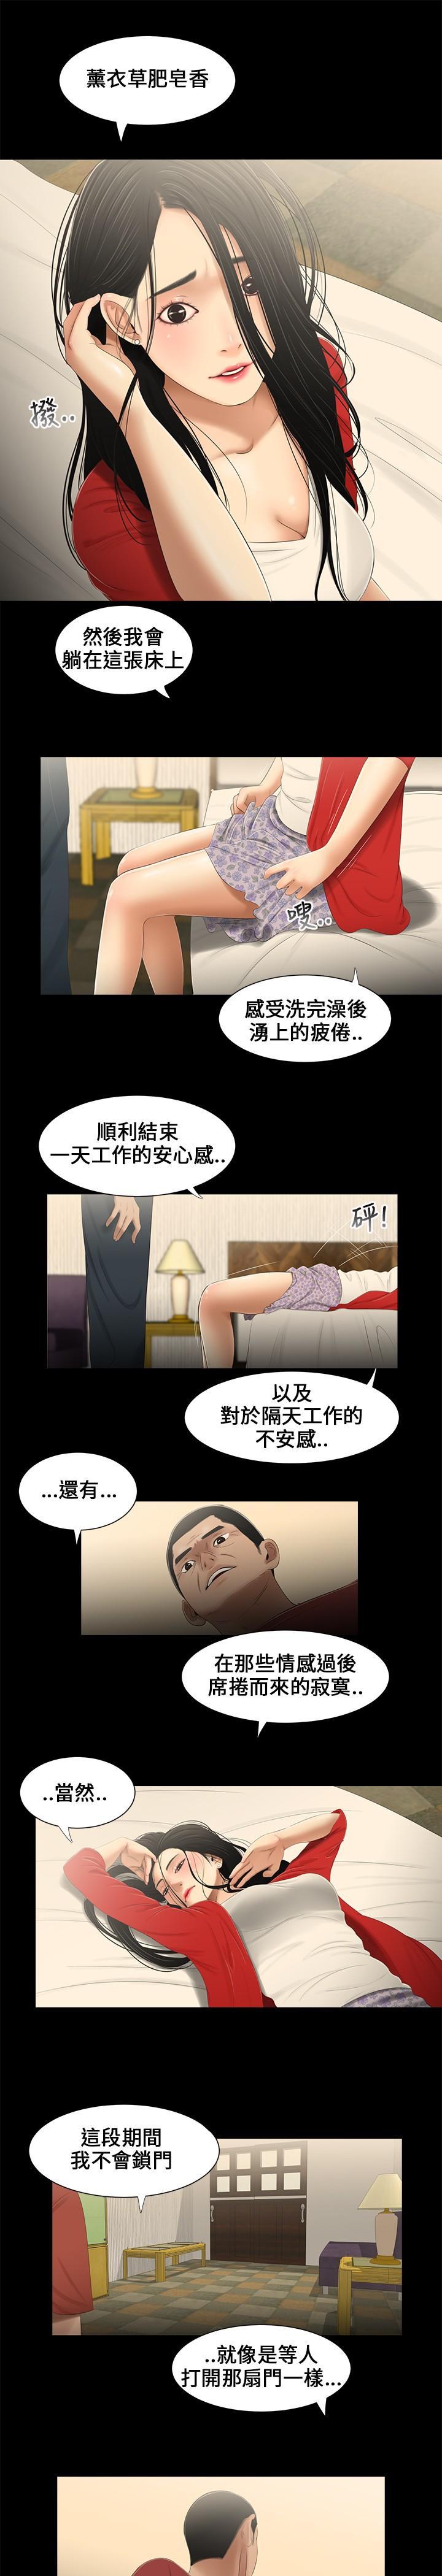 Three sisters 三姐妹Ch.13~19 (Chinese)中文 28